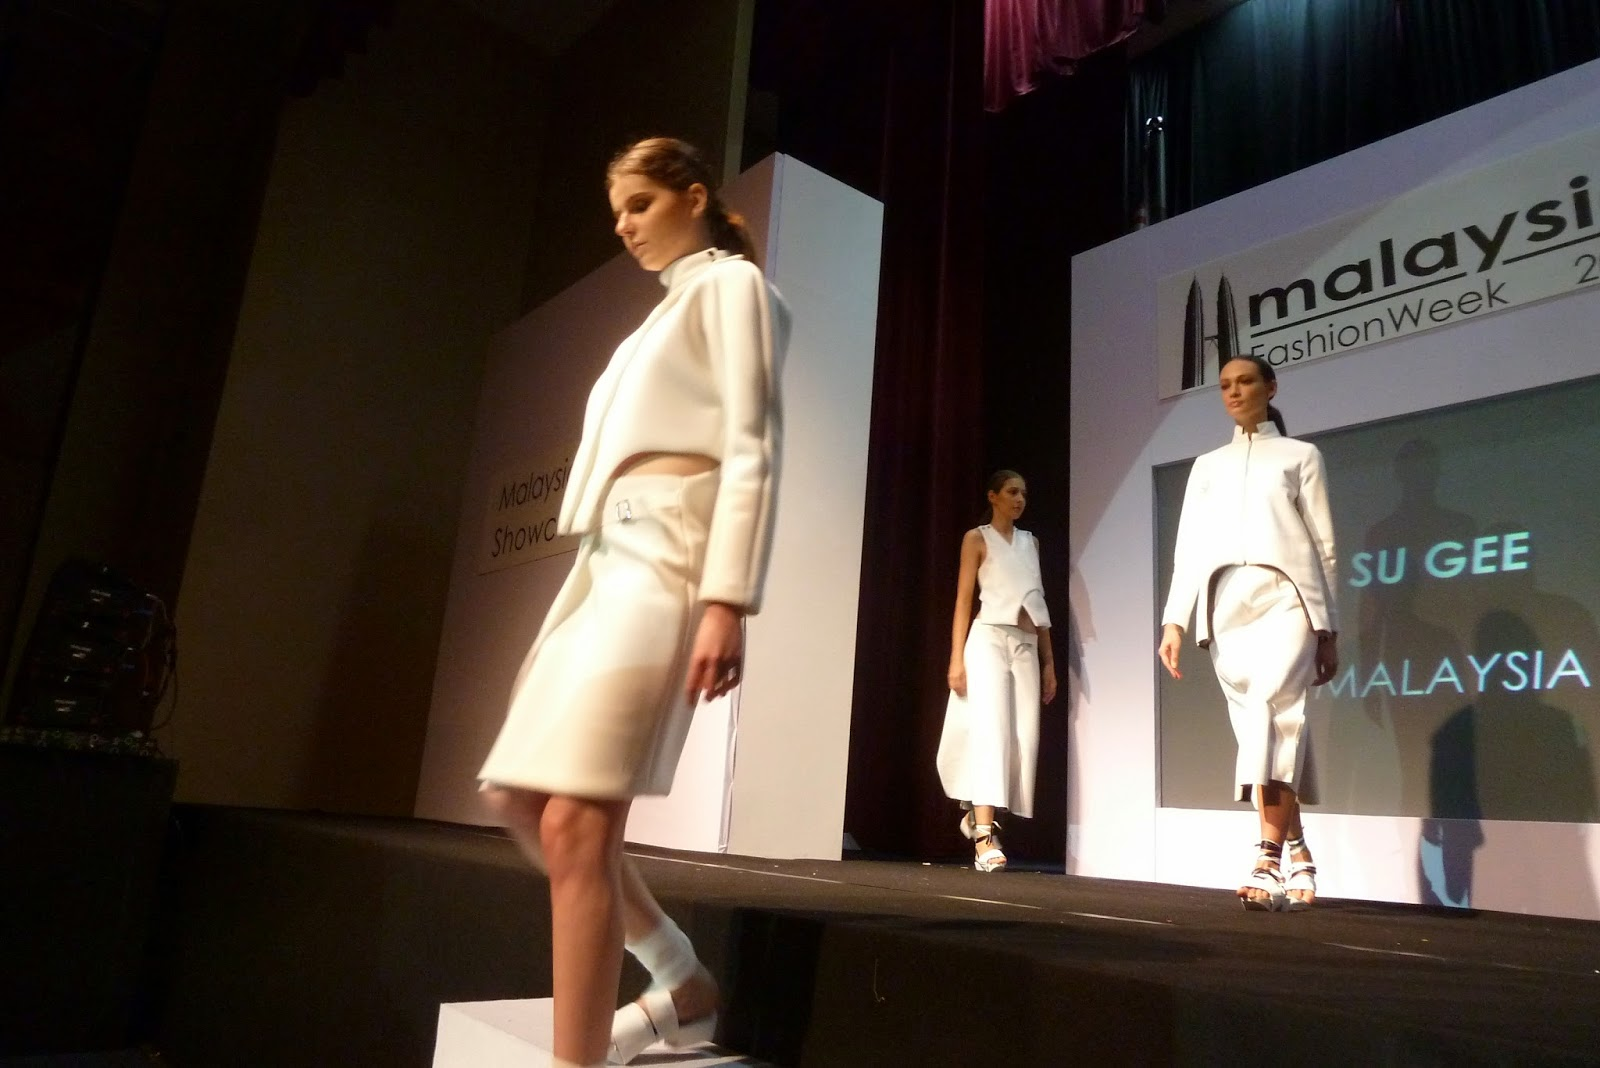 Fashion Show 2014 Malaysia KEE HUA CHEE SHOW MODELS